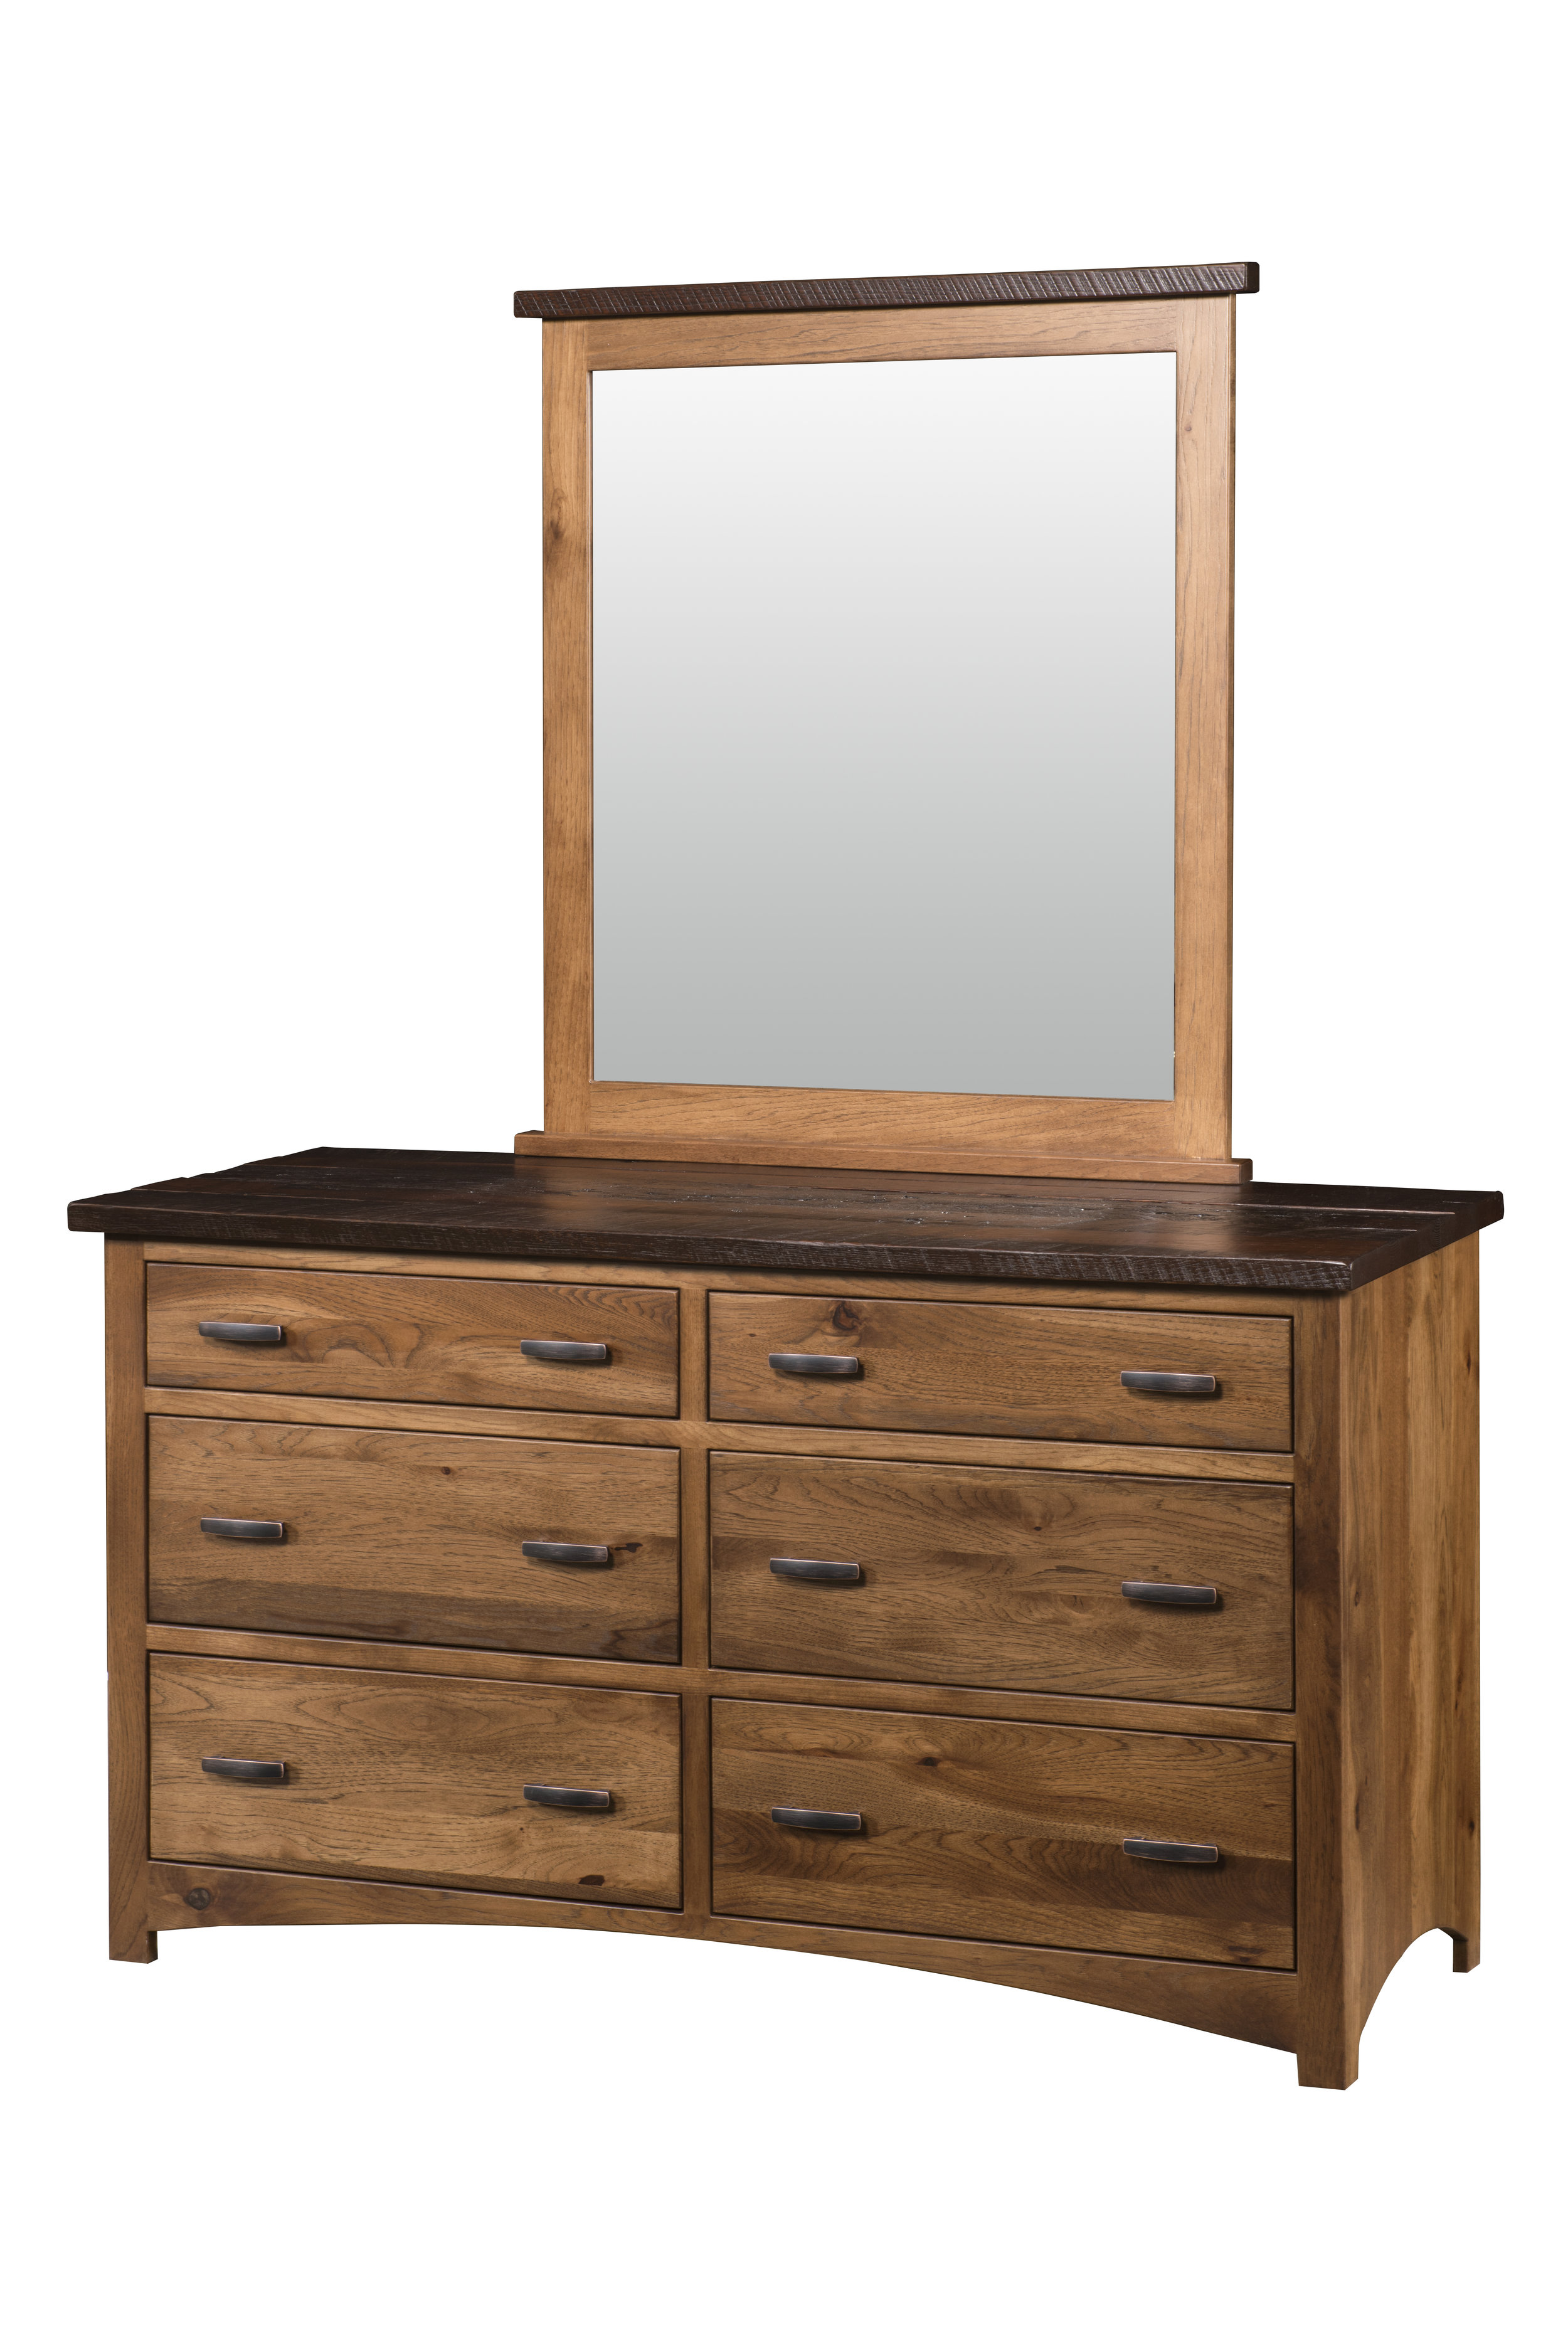 MH-2154 Dresser wMI-1665.jpg